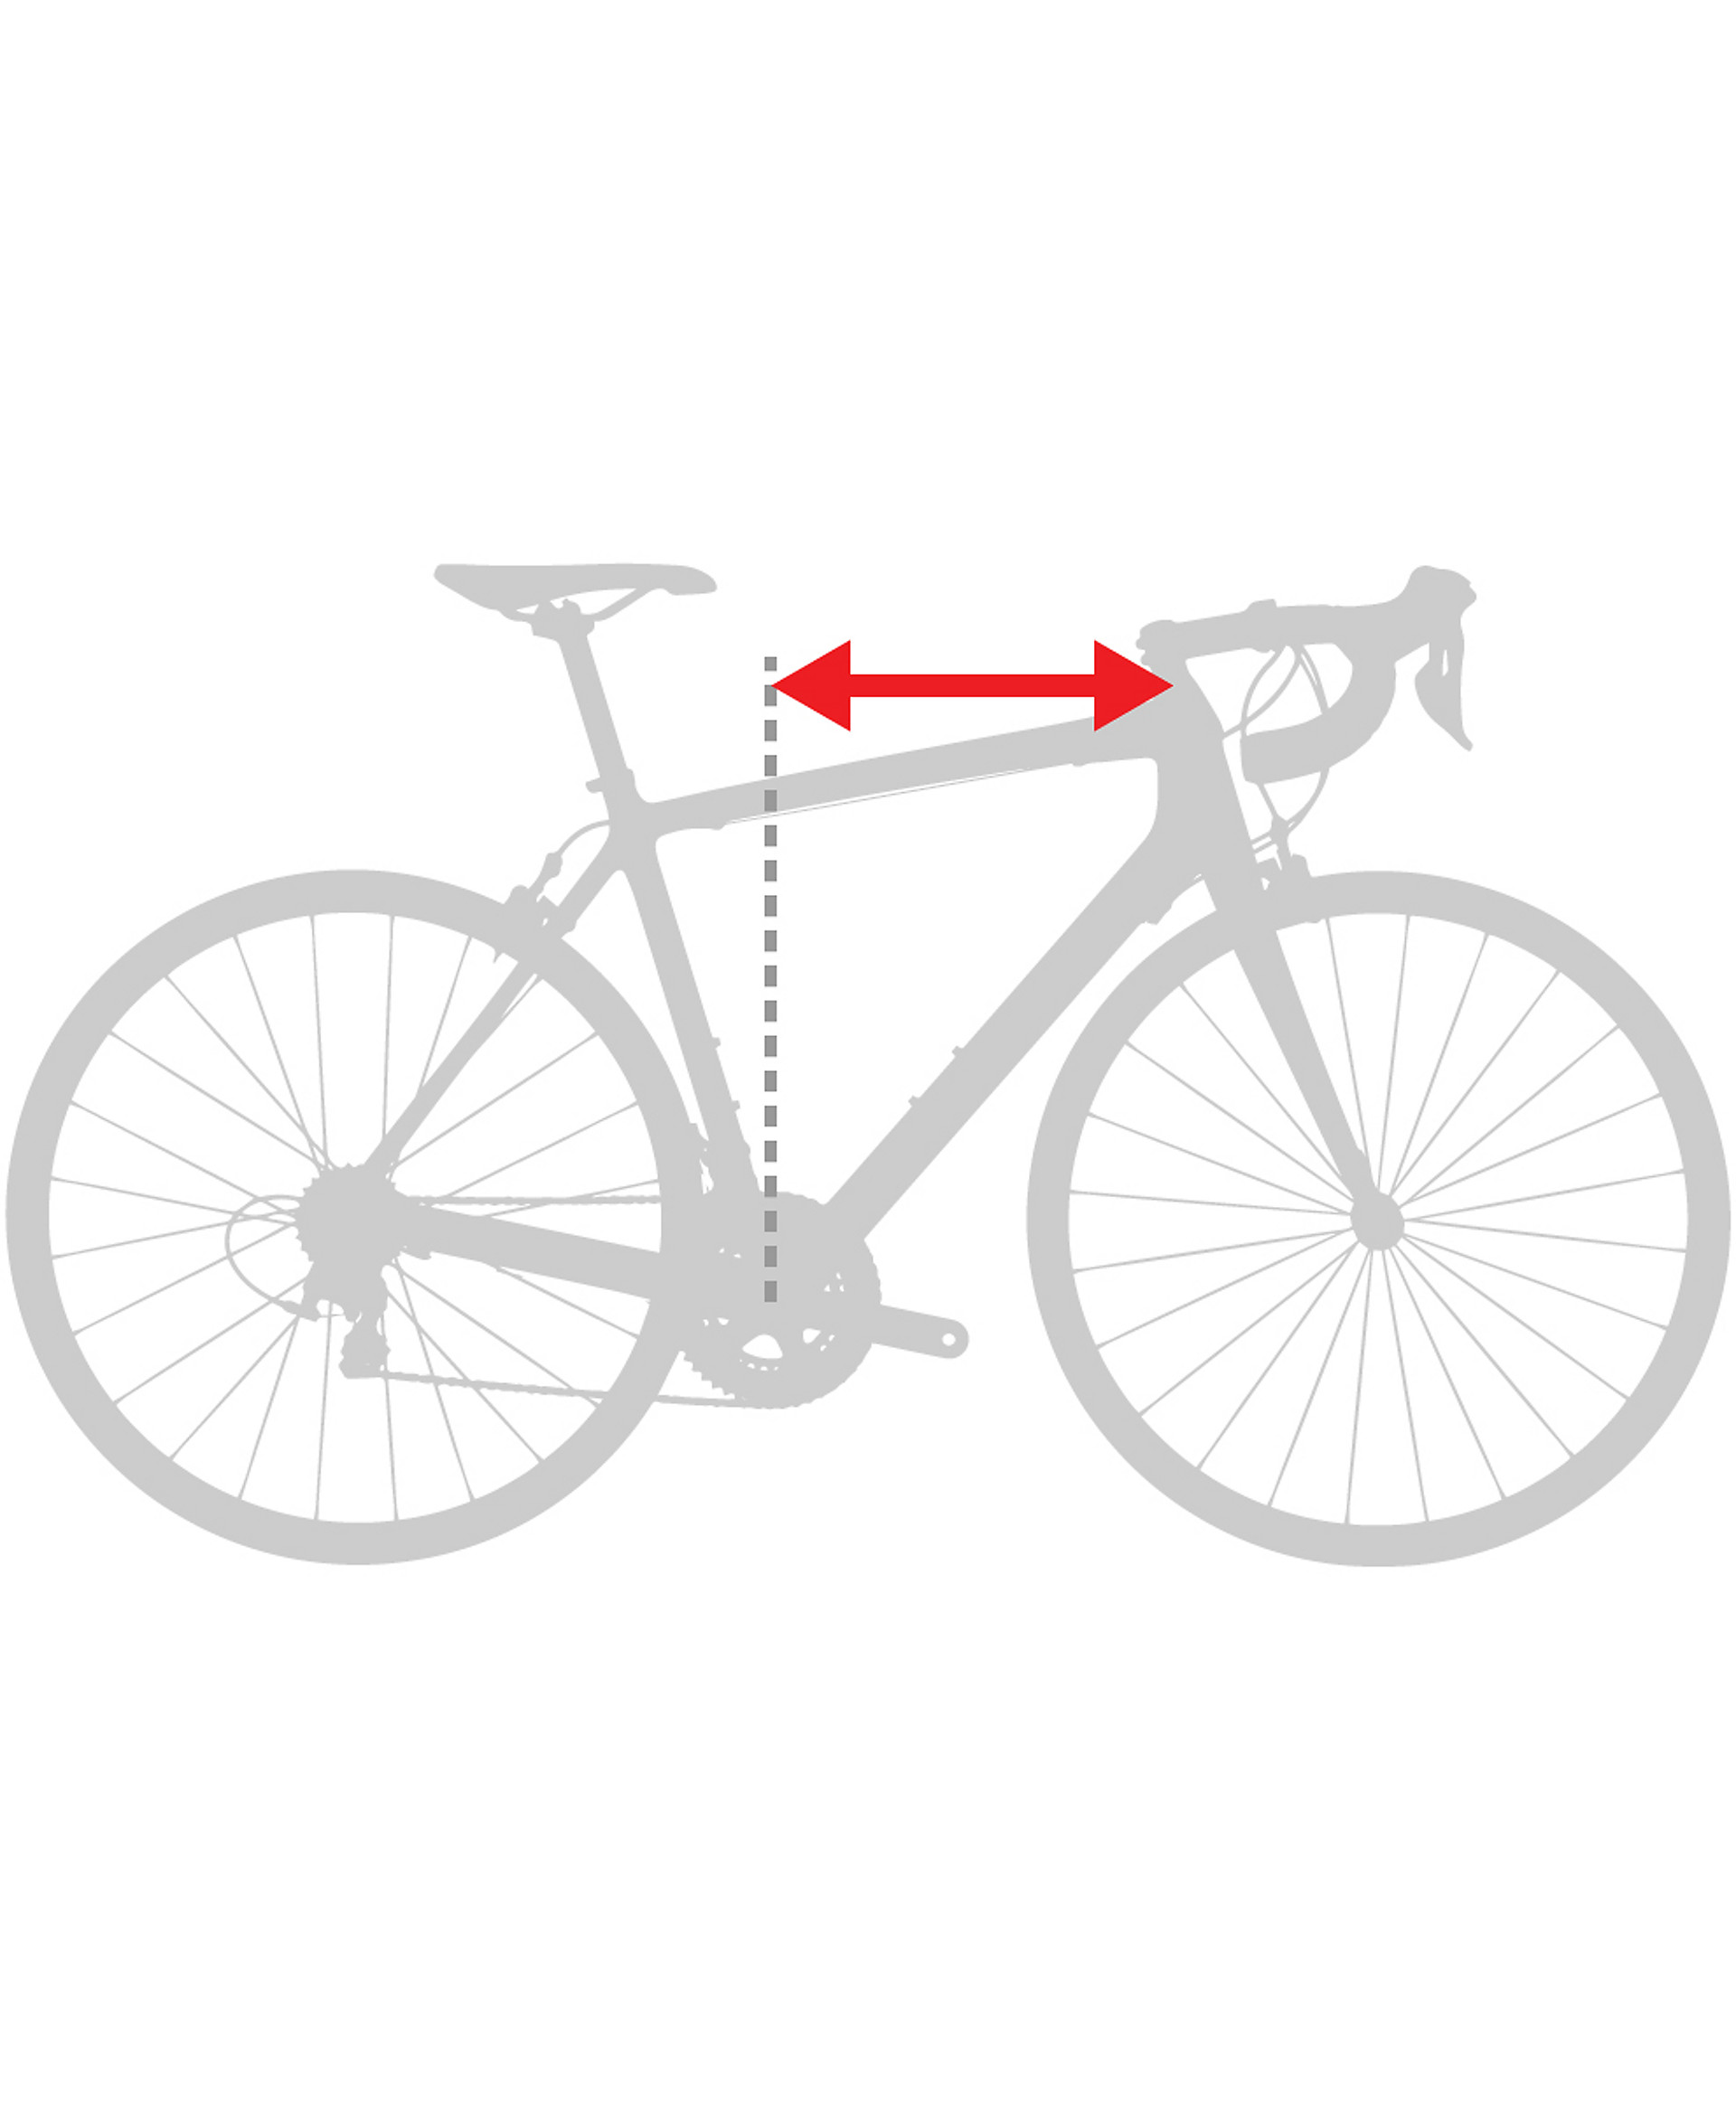 Trek road bike sizing guide | Trek Bikes